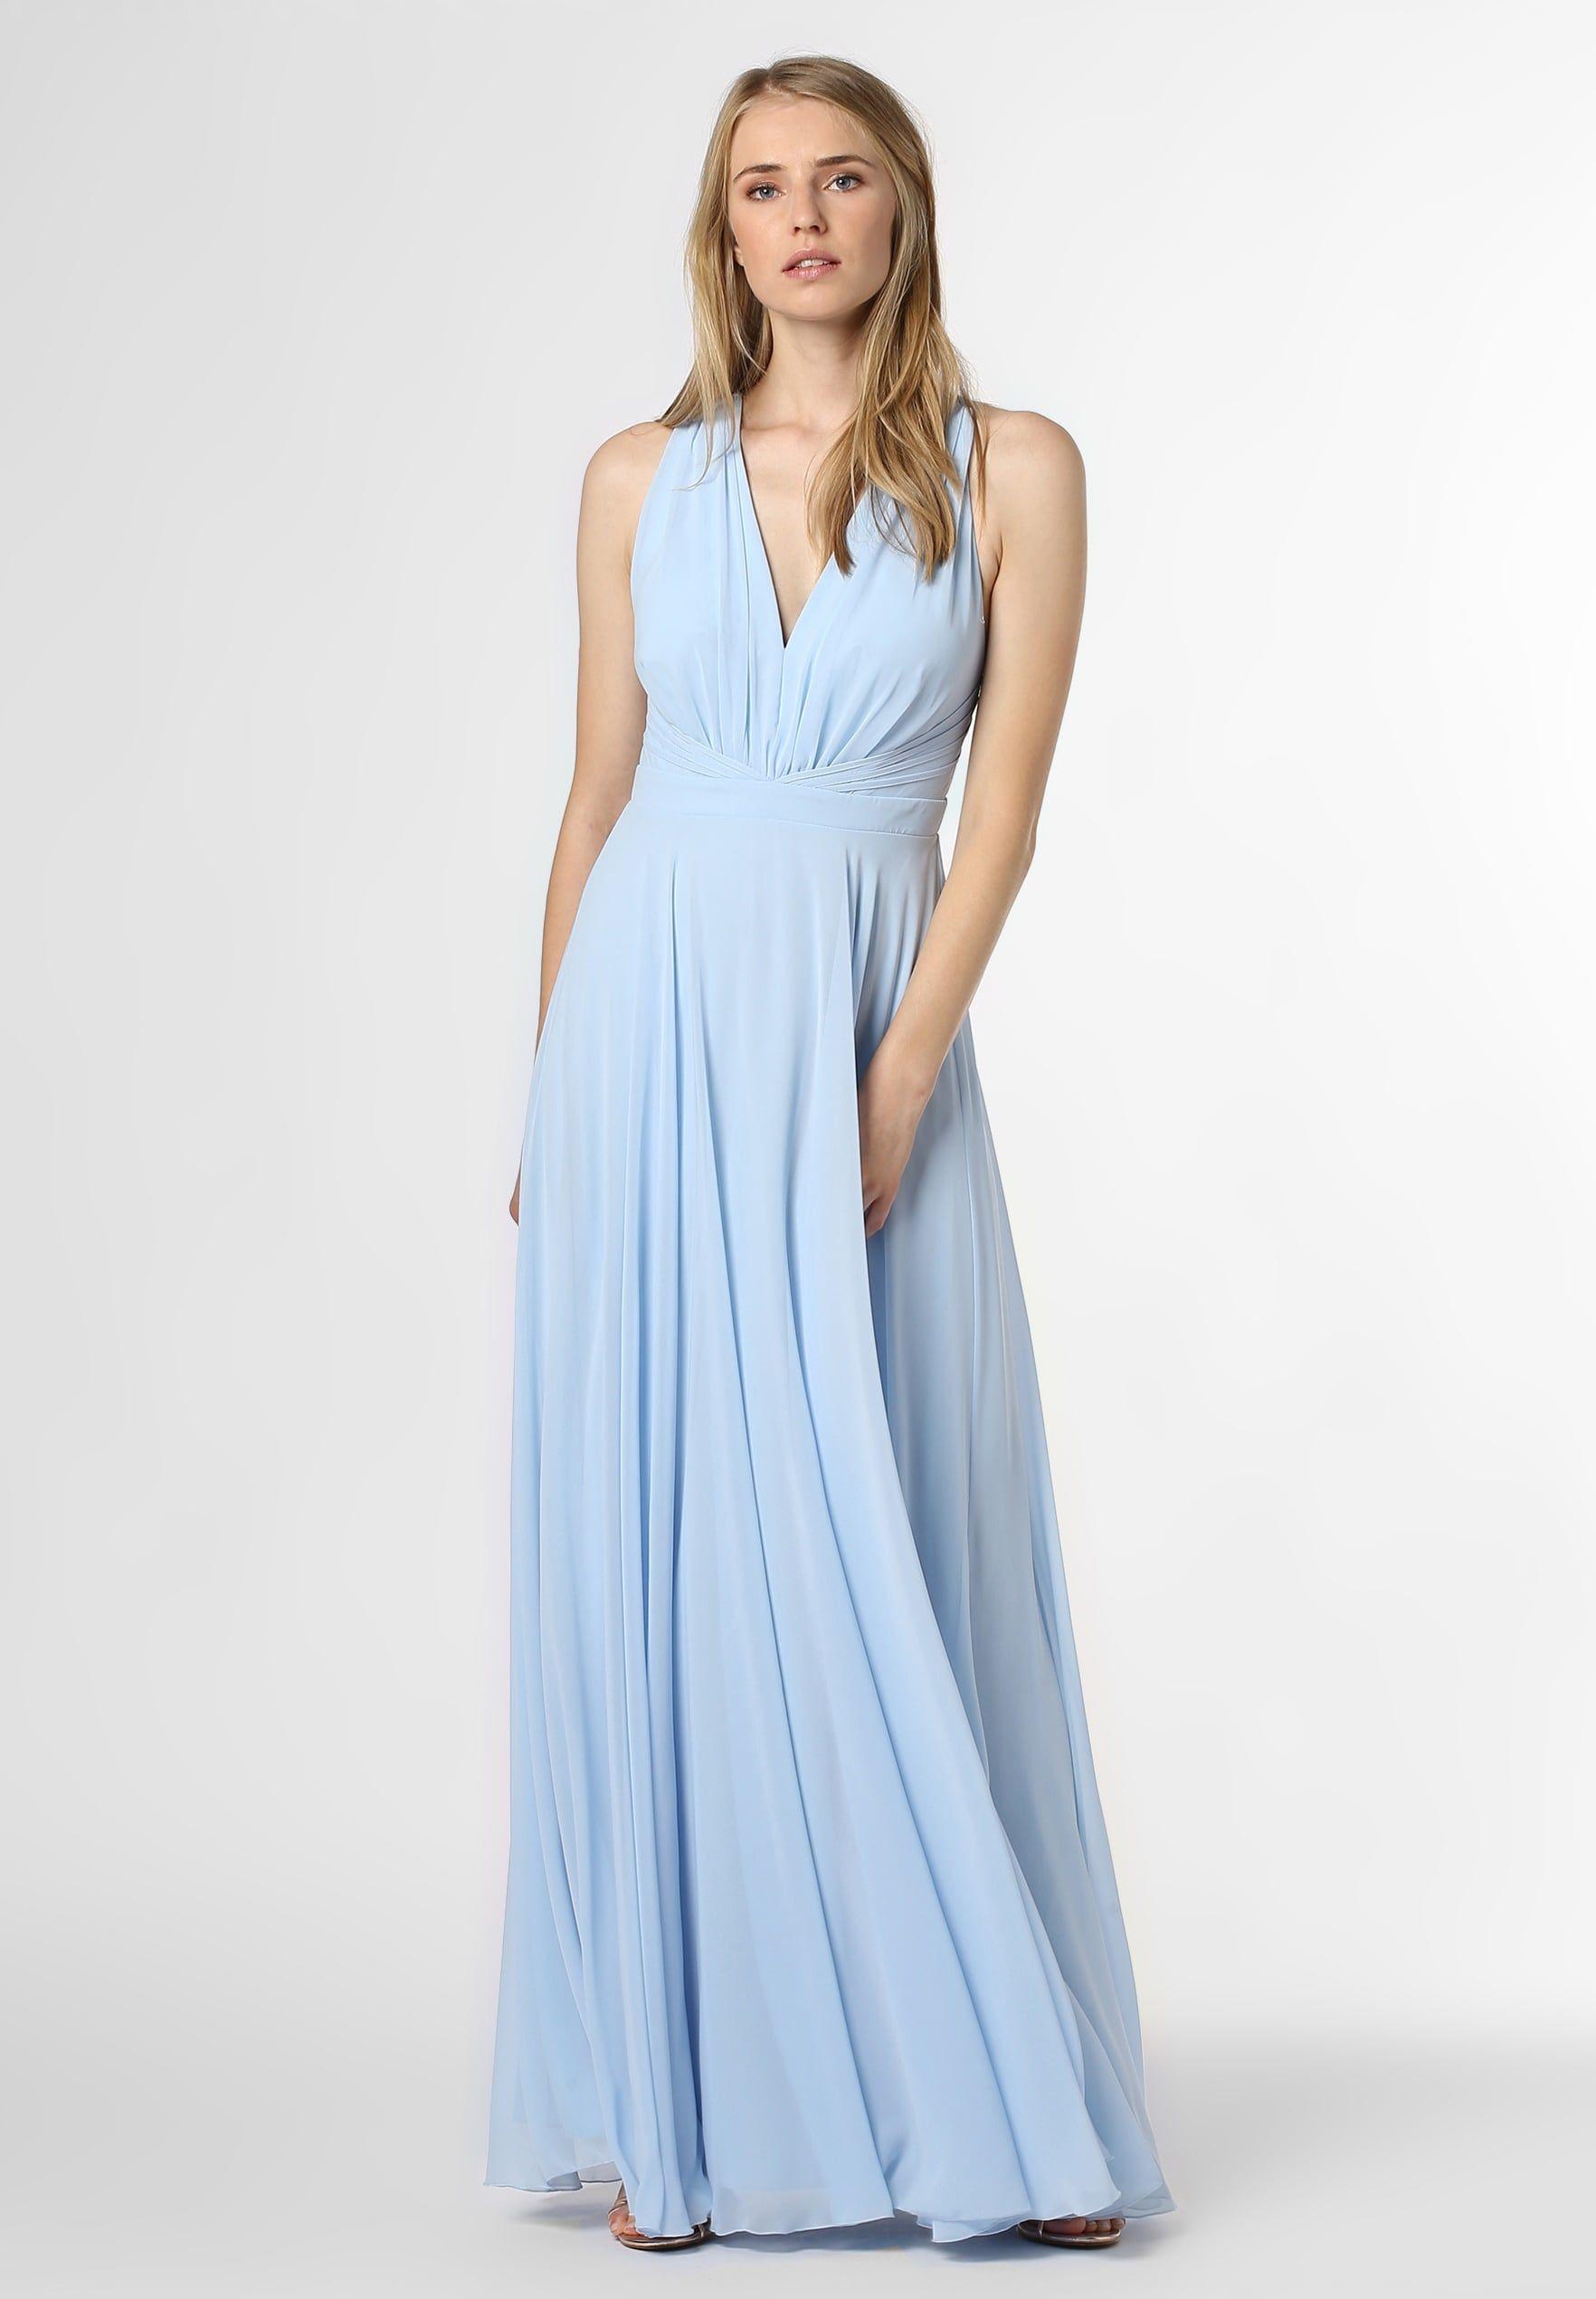 Ballkleid - hellblau @ Zalando.de 🛒 in 17  Dresses, Wedding